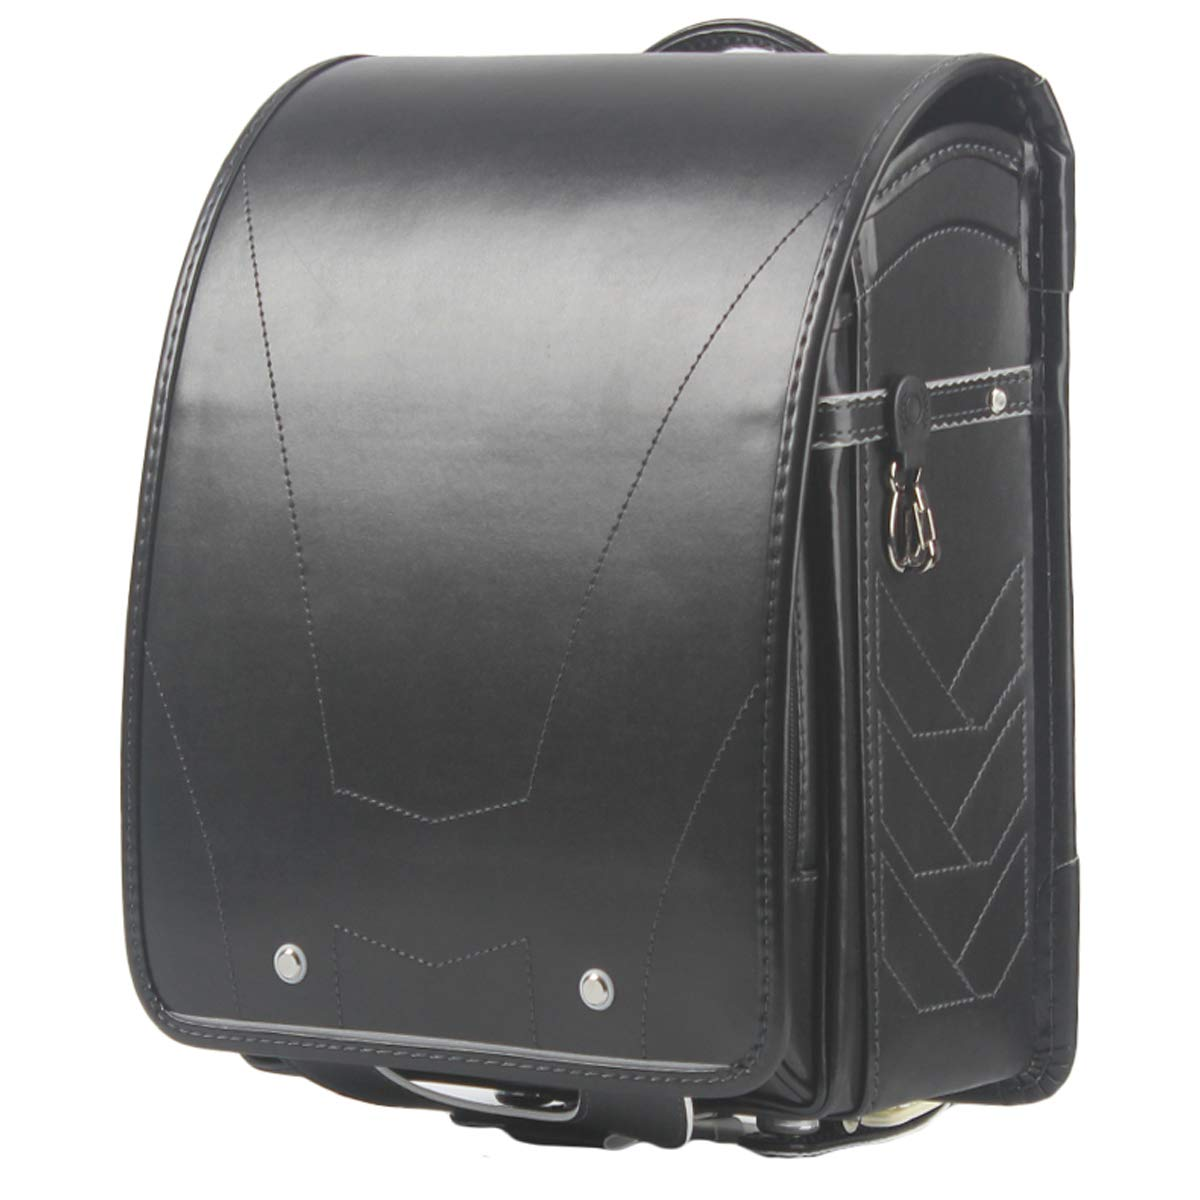 randoseru ransel bag Japanese school bag Semi-automatic satchel for girls and boys Large capacity light weight Rain Cover (New Black35 x 26 x 15cm) by MilWorld